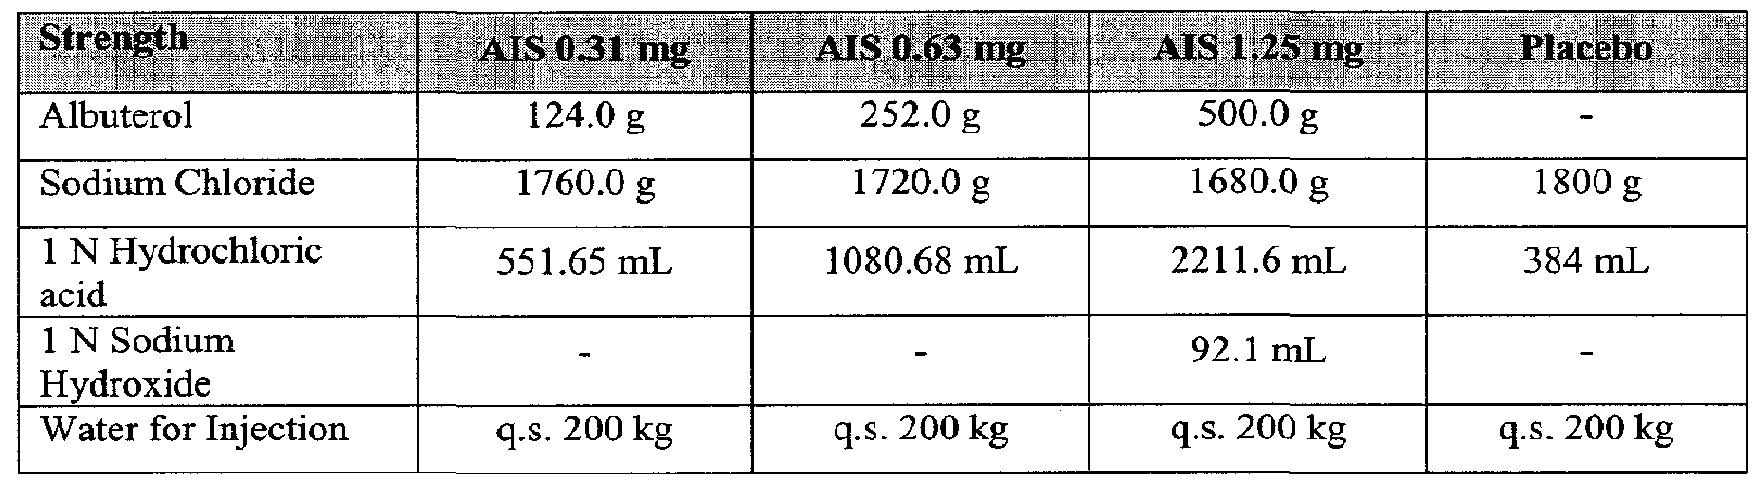 Albuterol Dosage Child